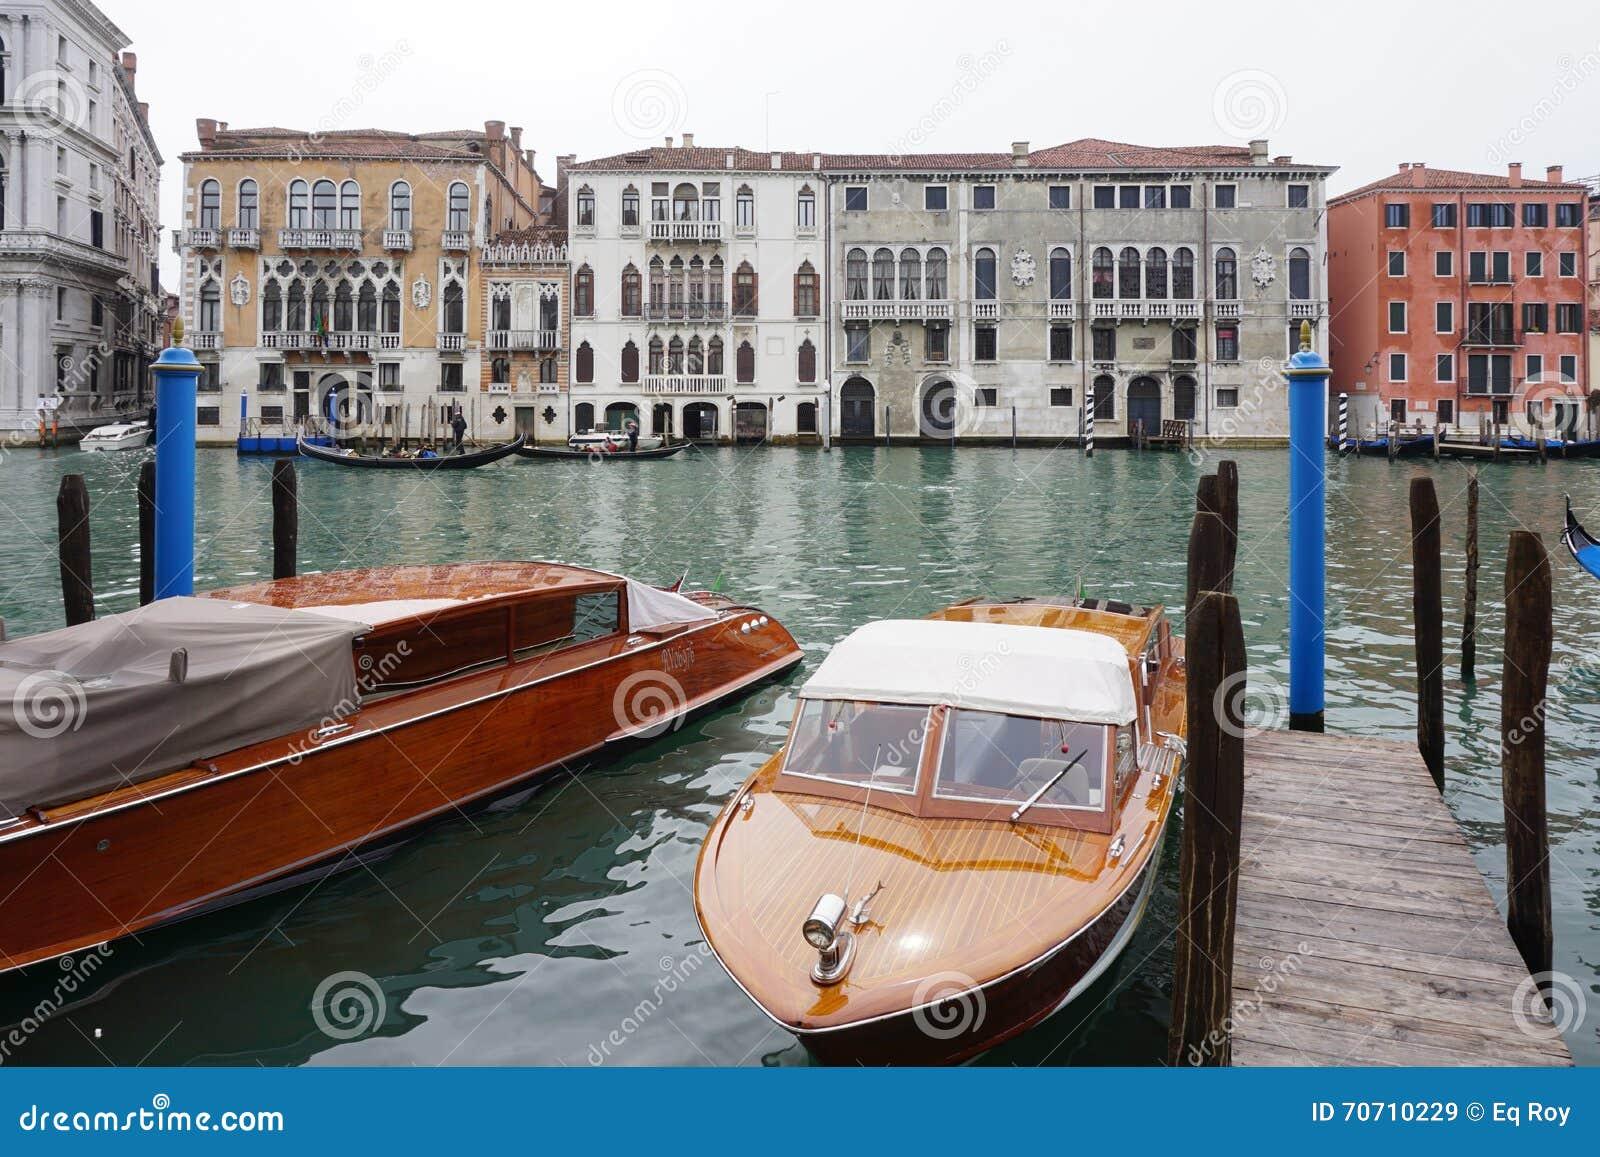 Papadopoli Hotel In Venice Italy